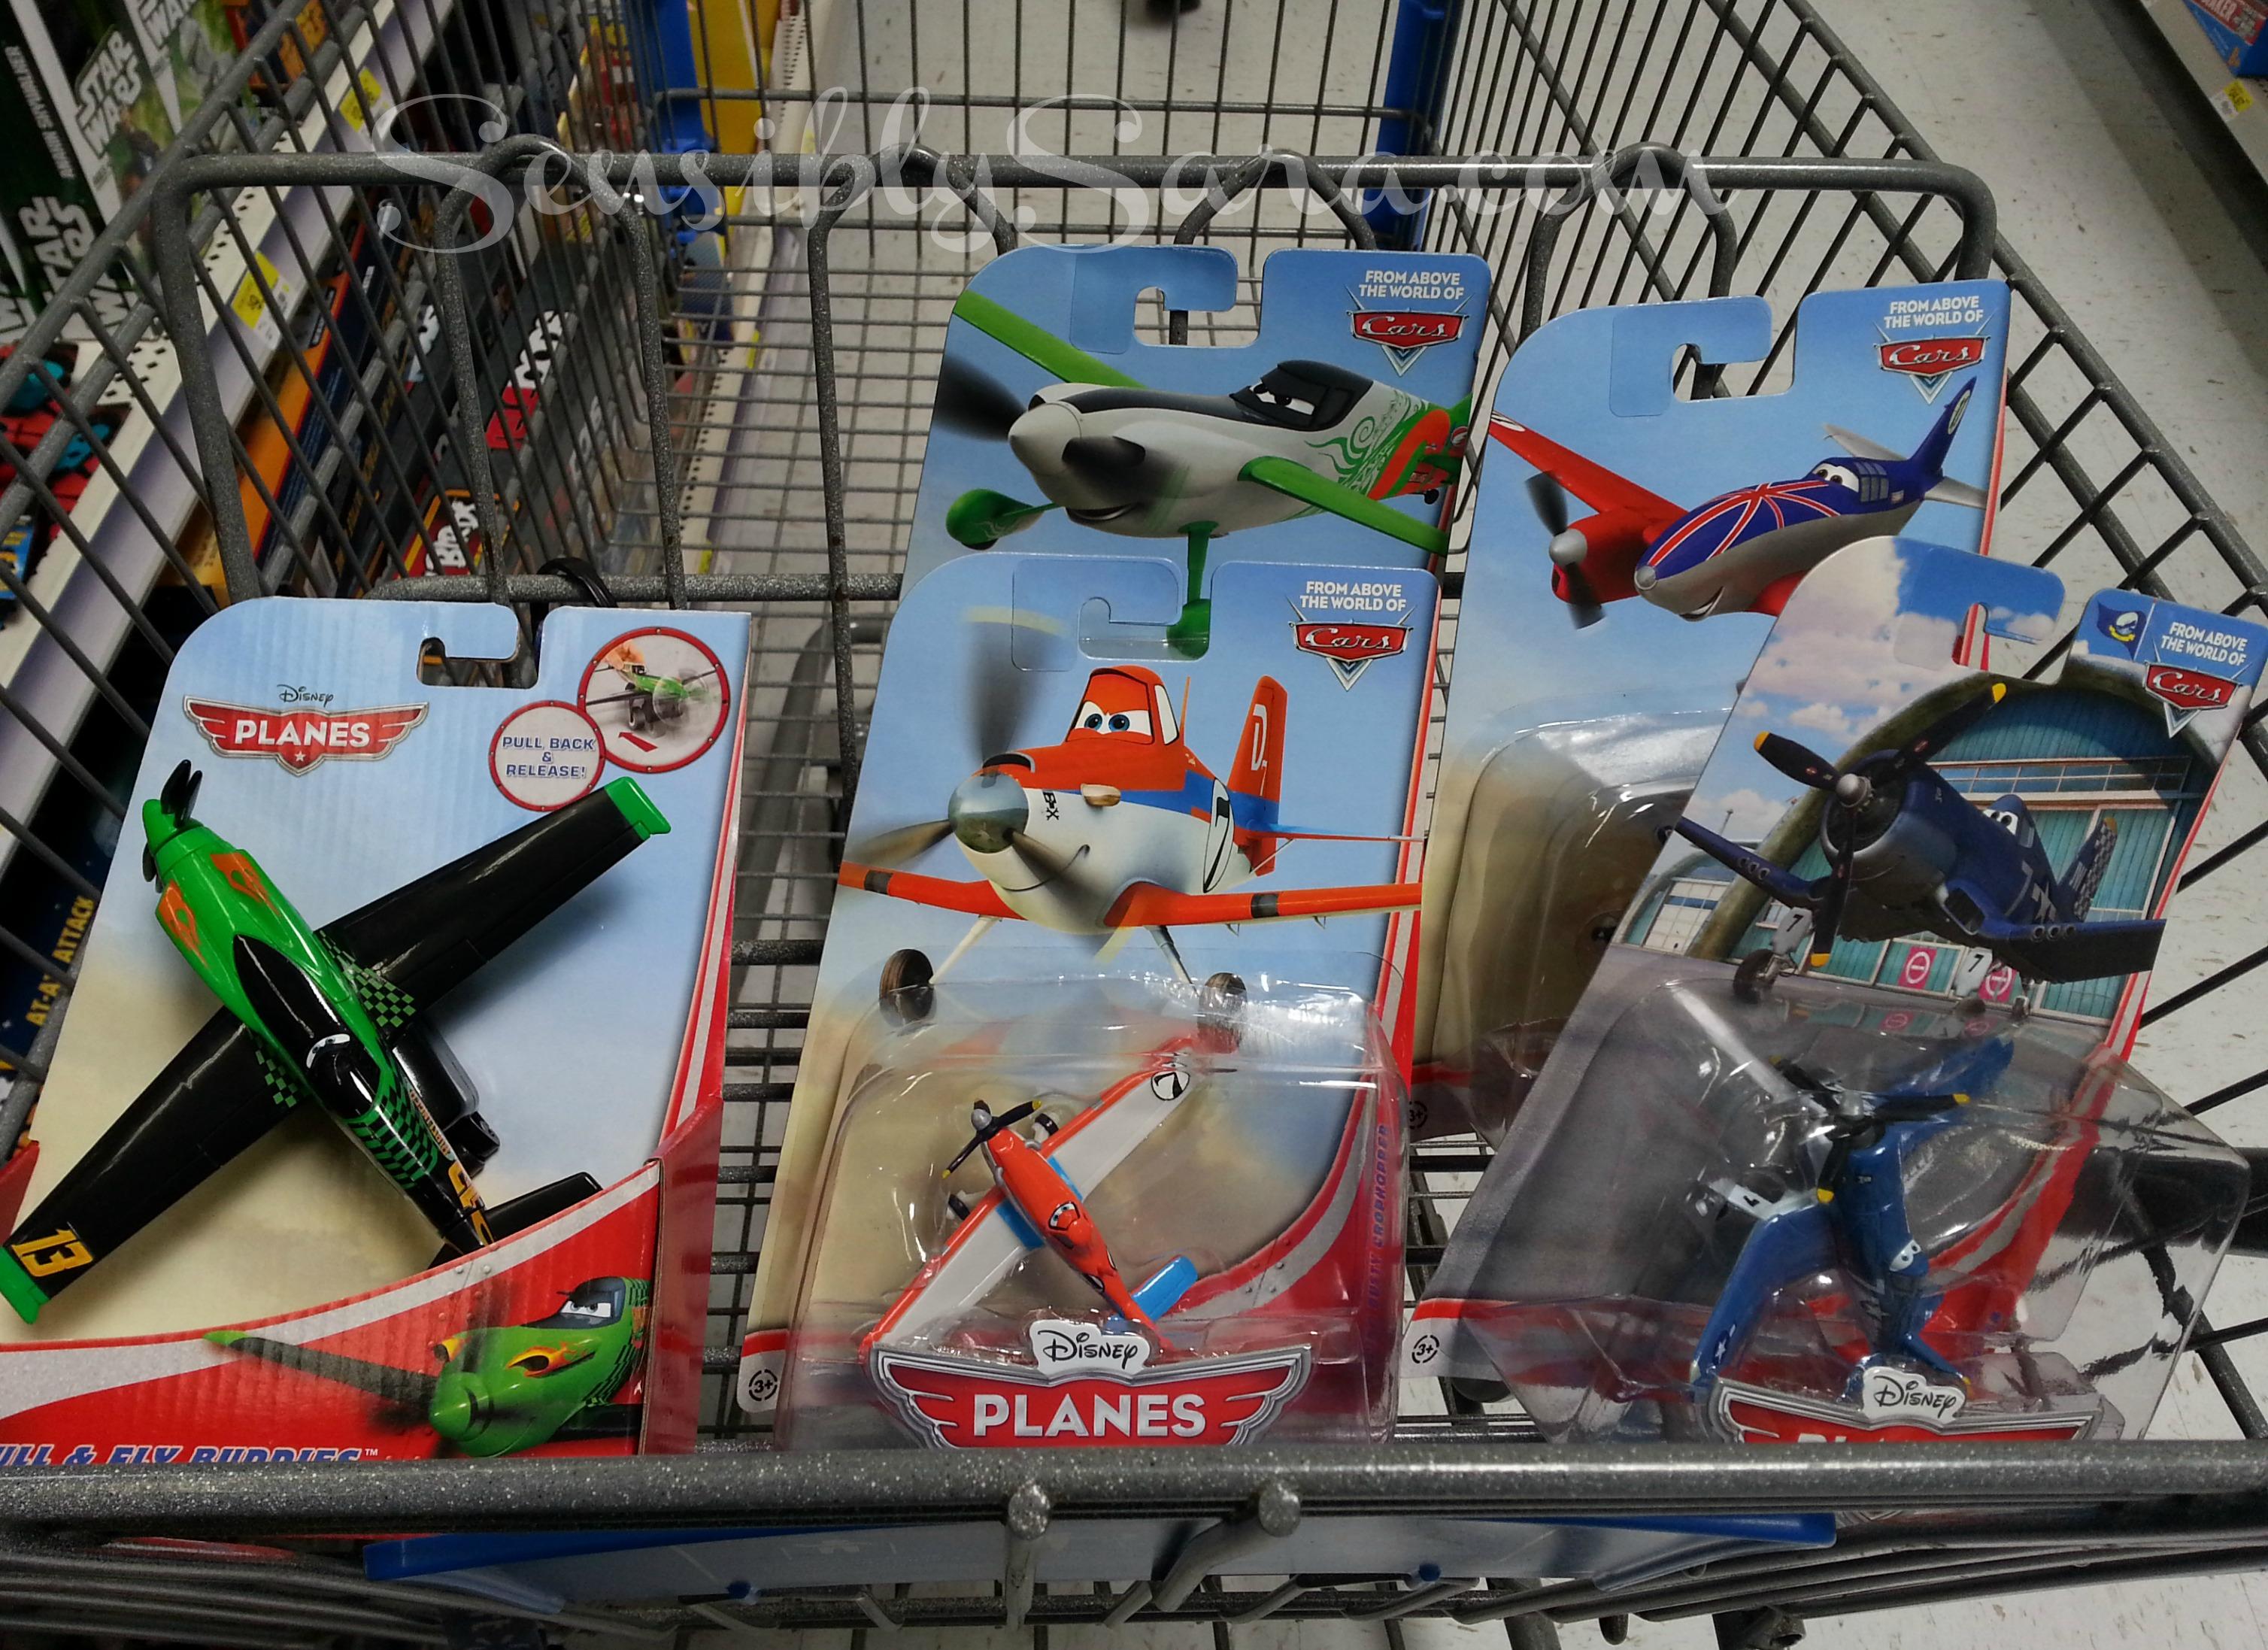 Walmart Helicopter Toys For Boys : Disney planes toys at walmart worldofcars cbias shop